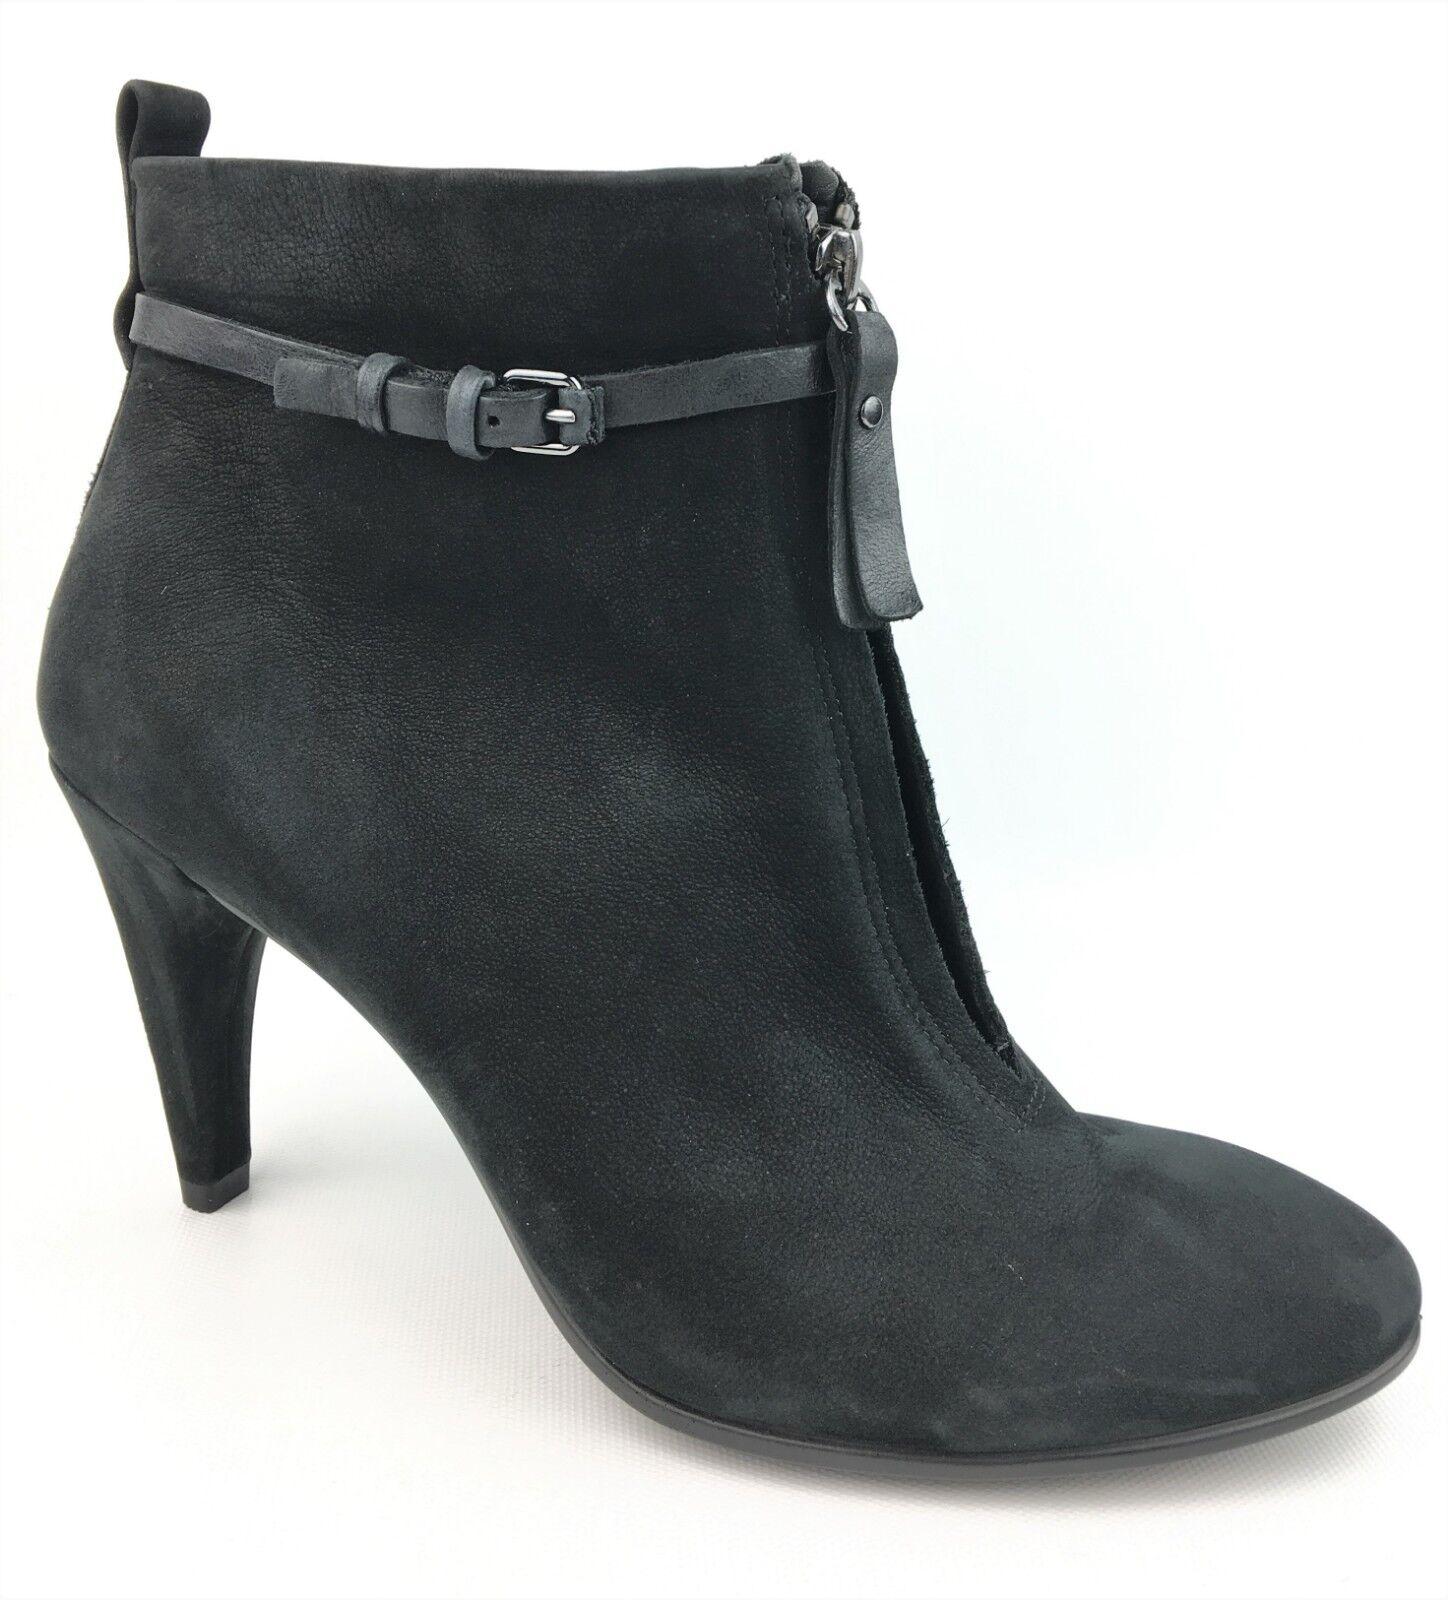 ECCO Shape 75 Sleek Black Nubuck Suede Ankle Heeled Booties sz  39 US 8-8.5